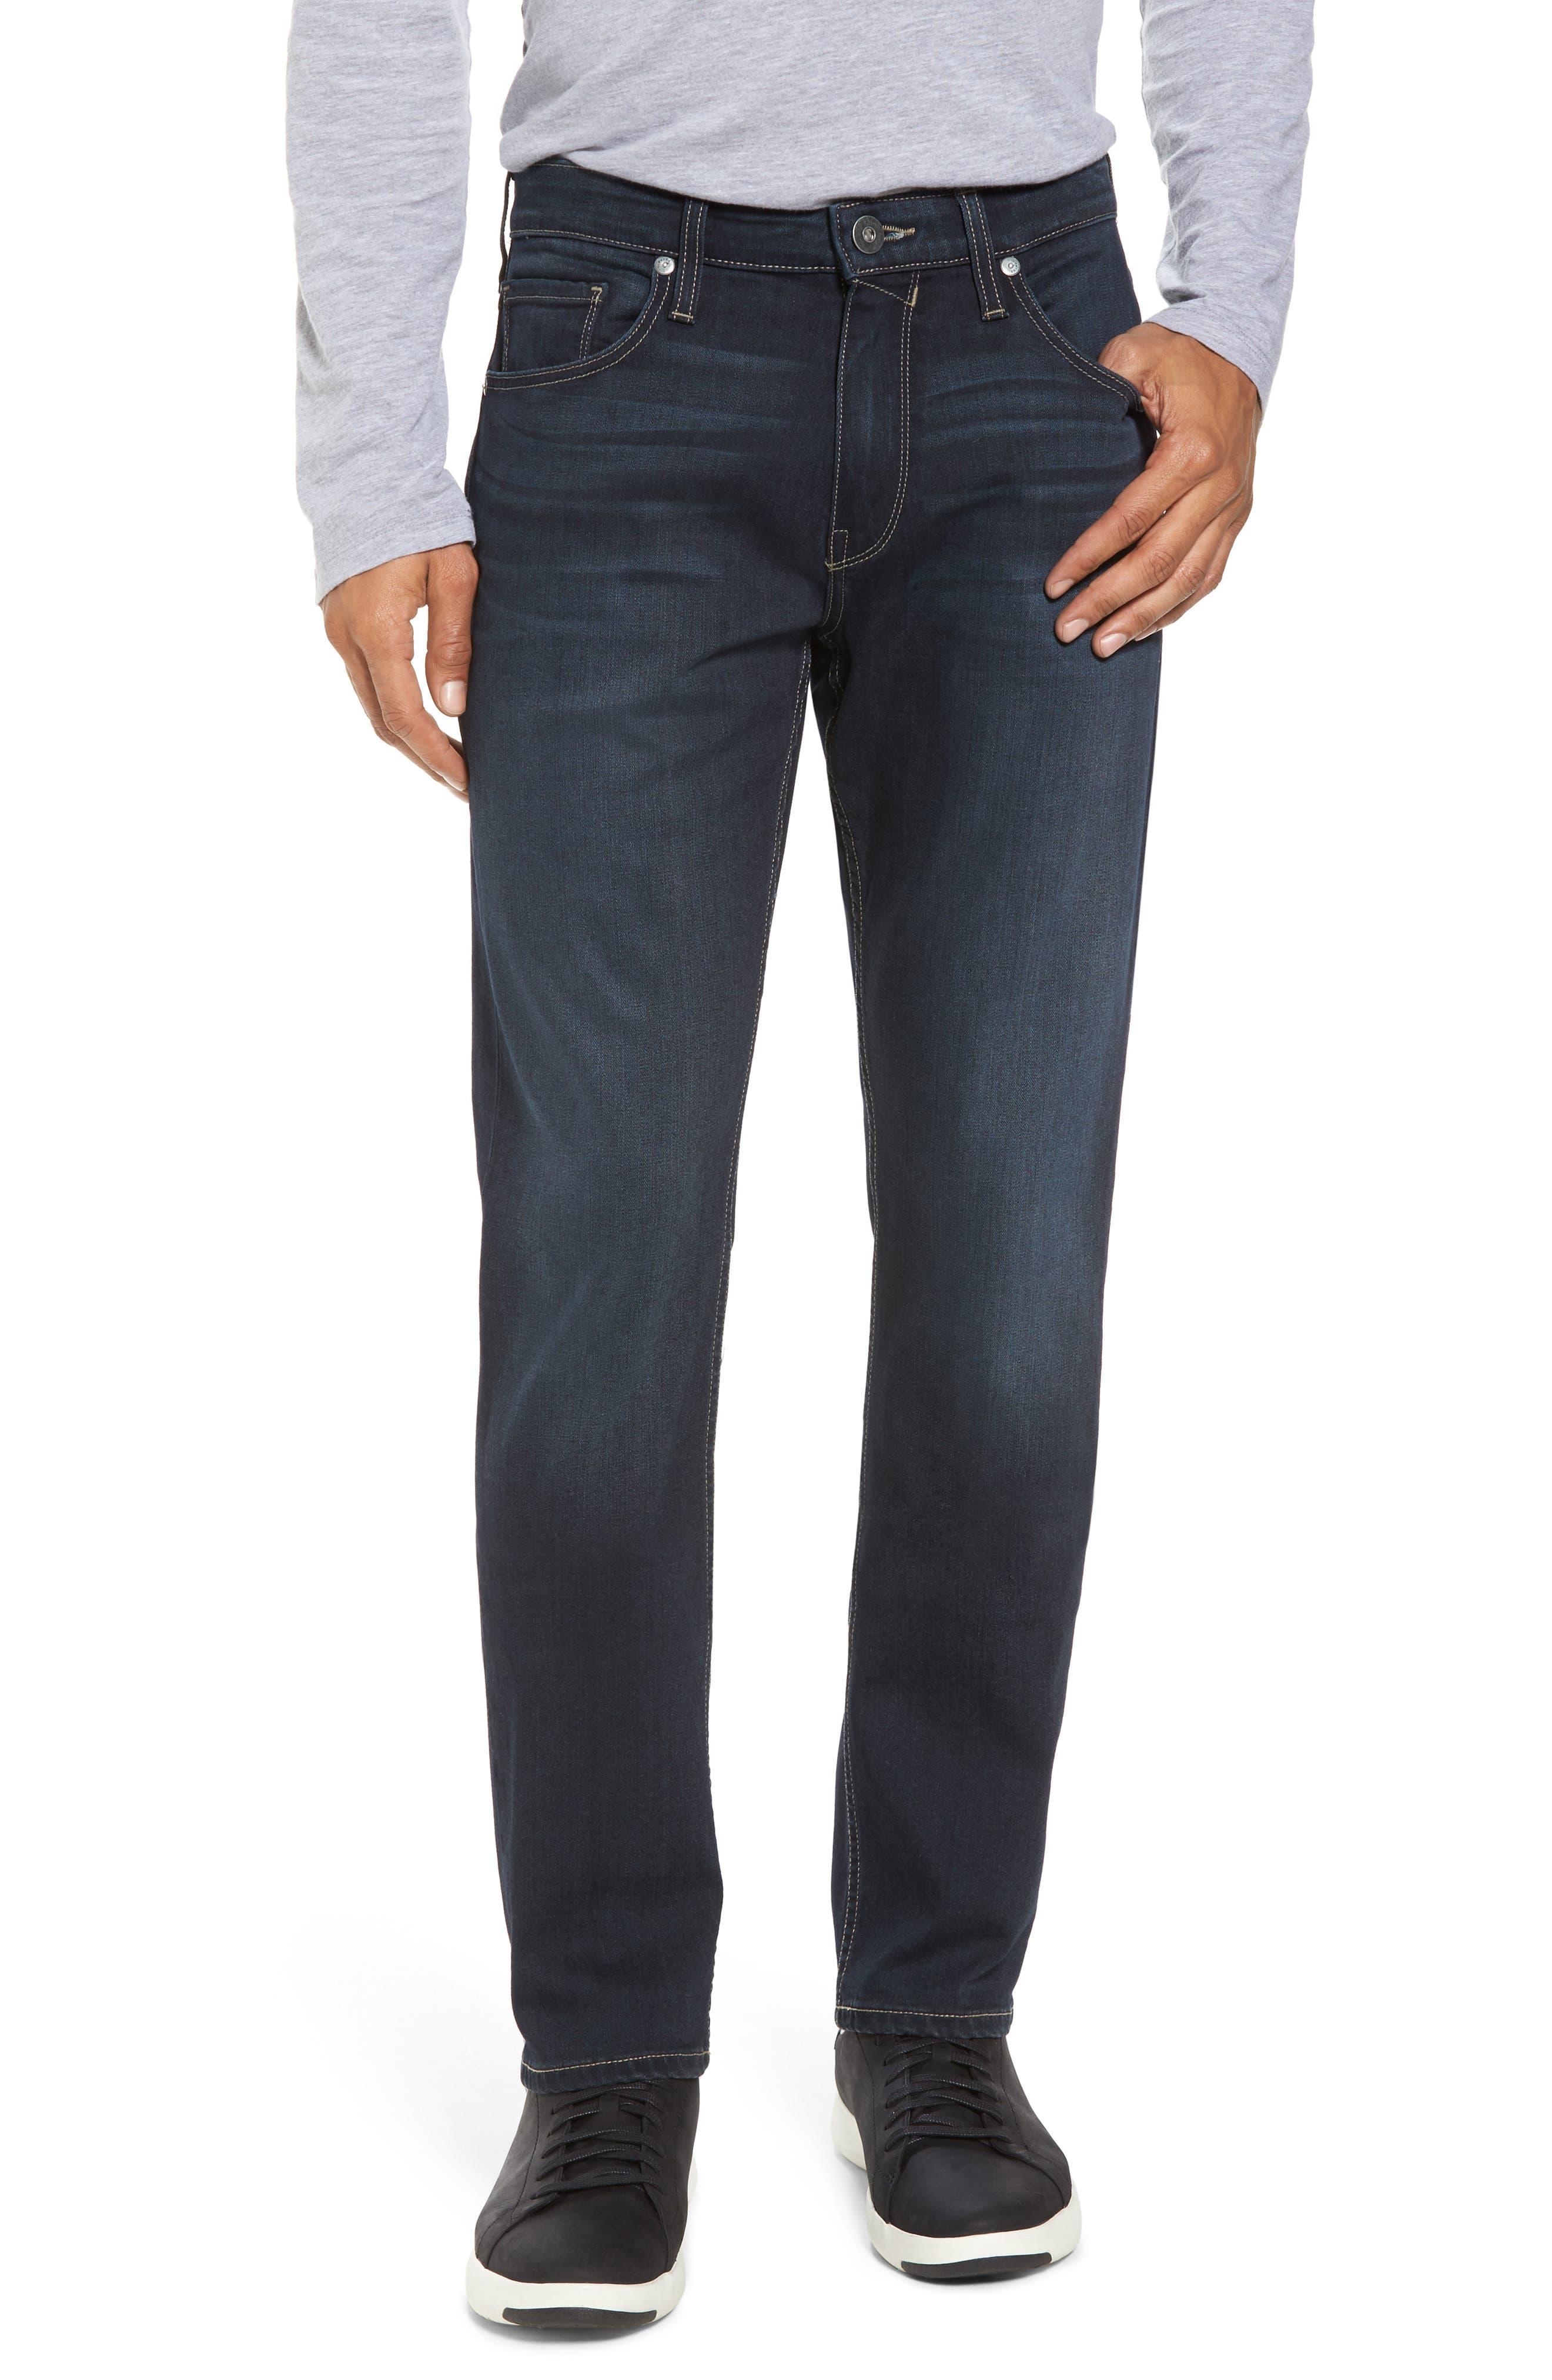 Transcend - Federal Slim Straight Leg Jeans,                         Main,                         color, Wilkins